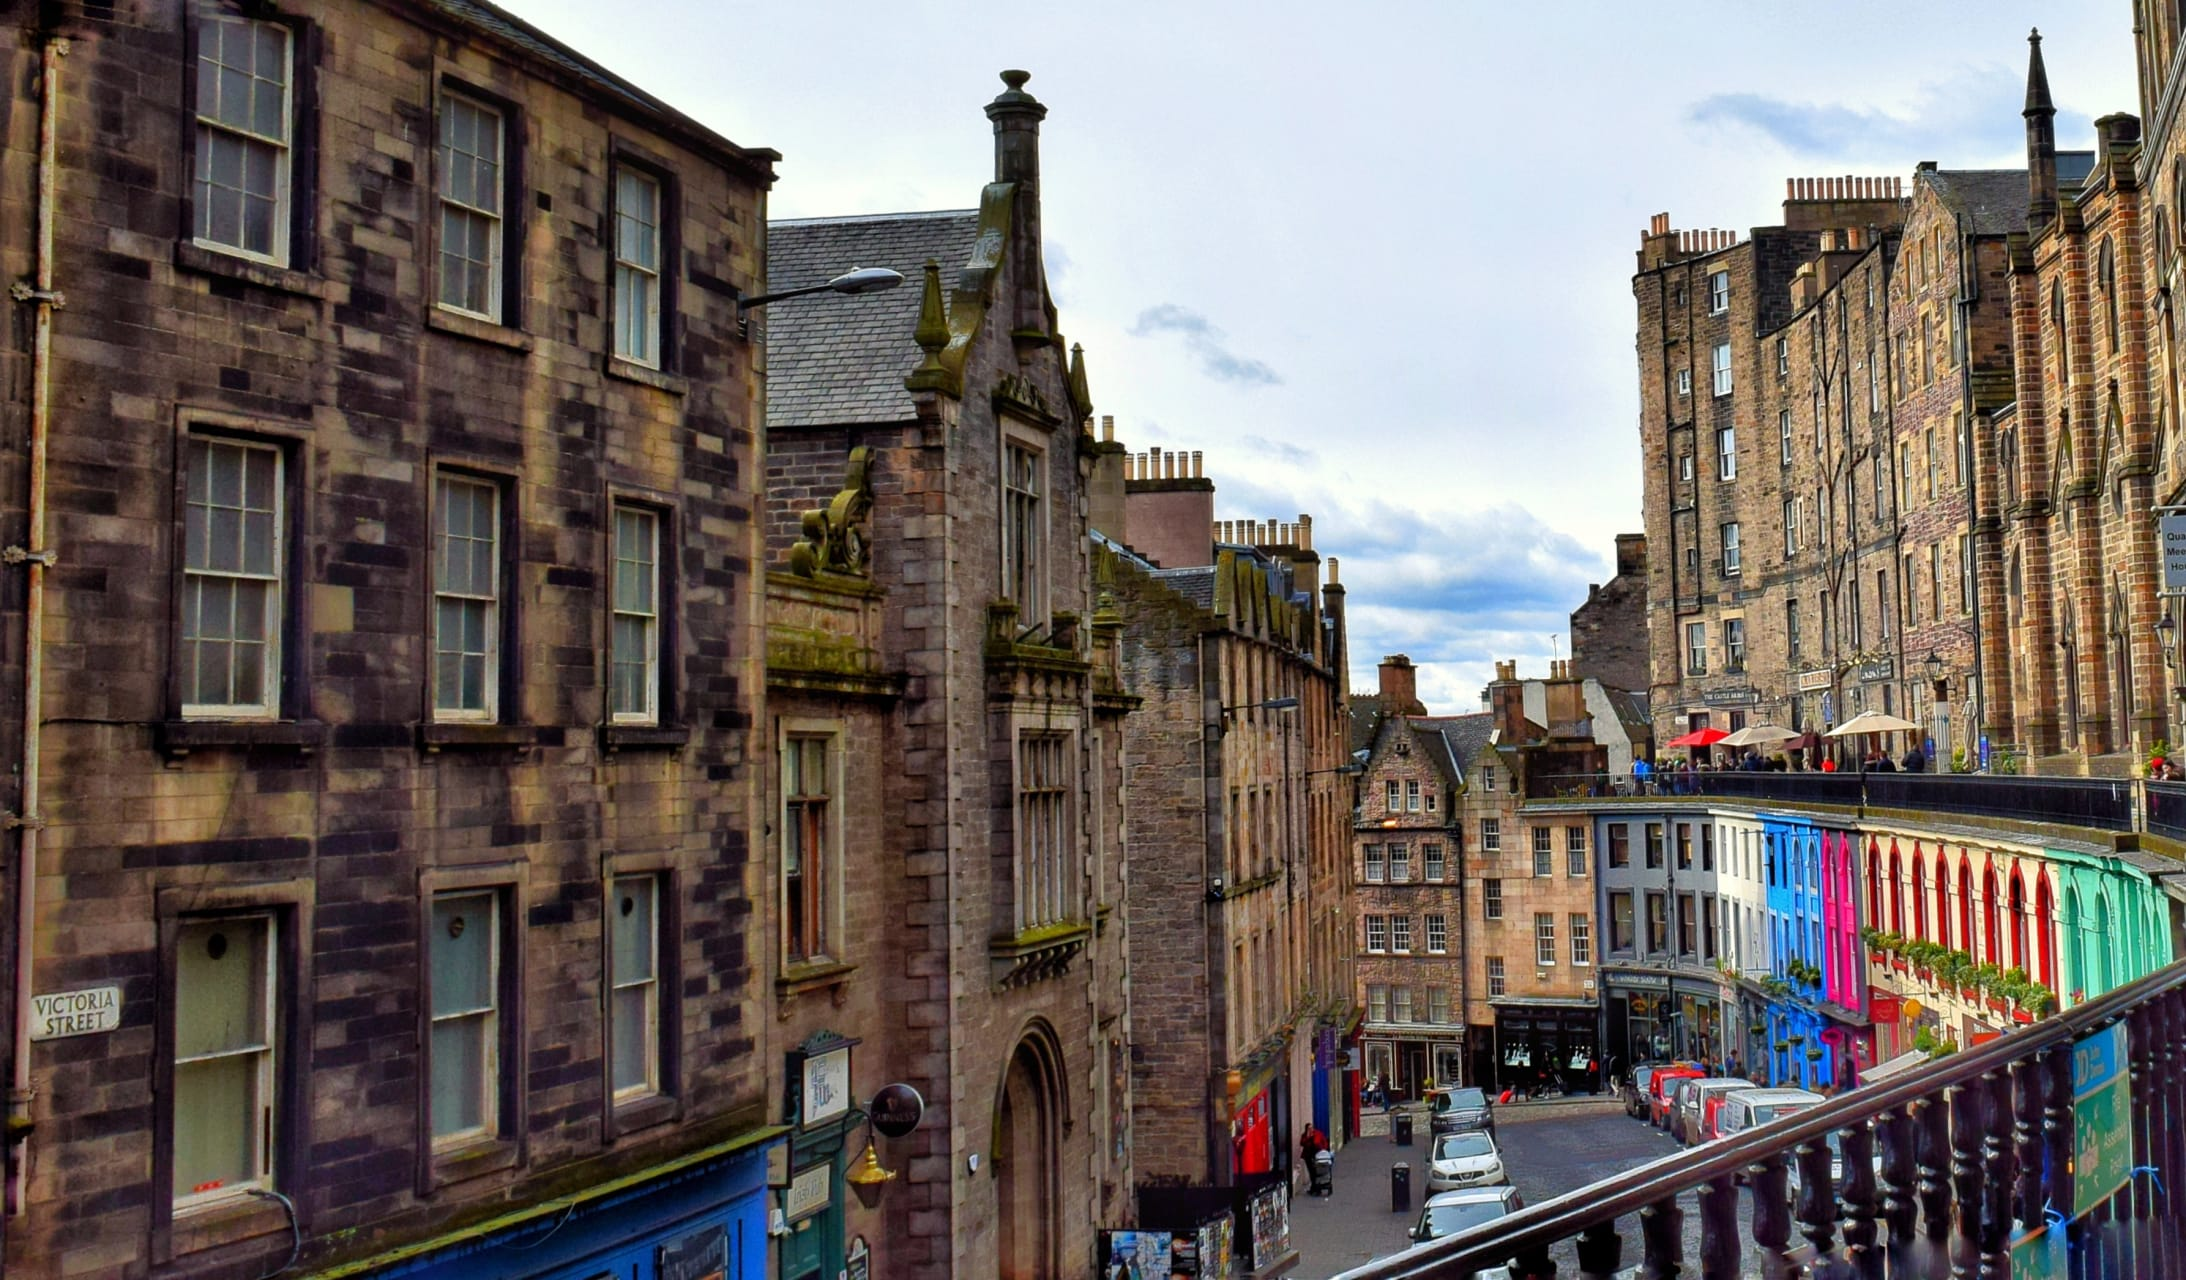 Edinburgh - Martin's Harry Potter Trail